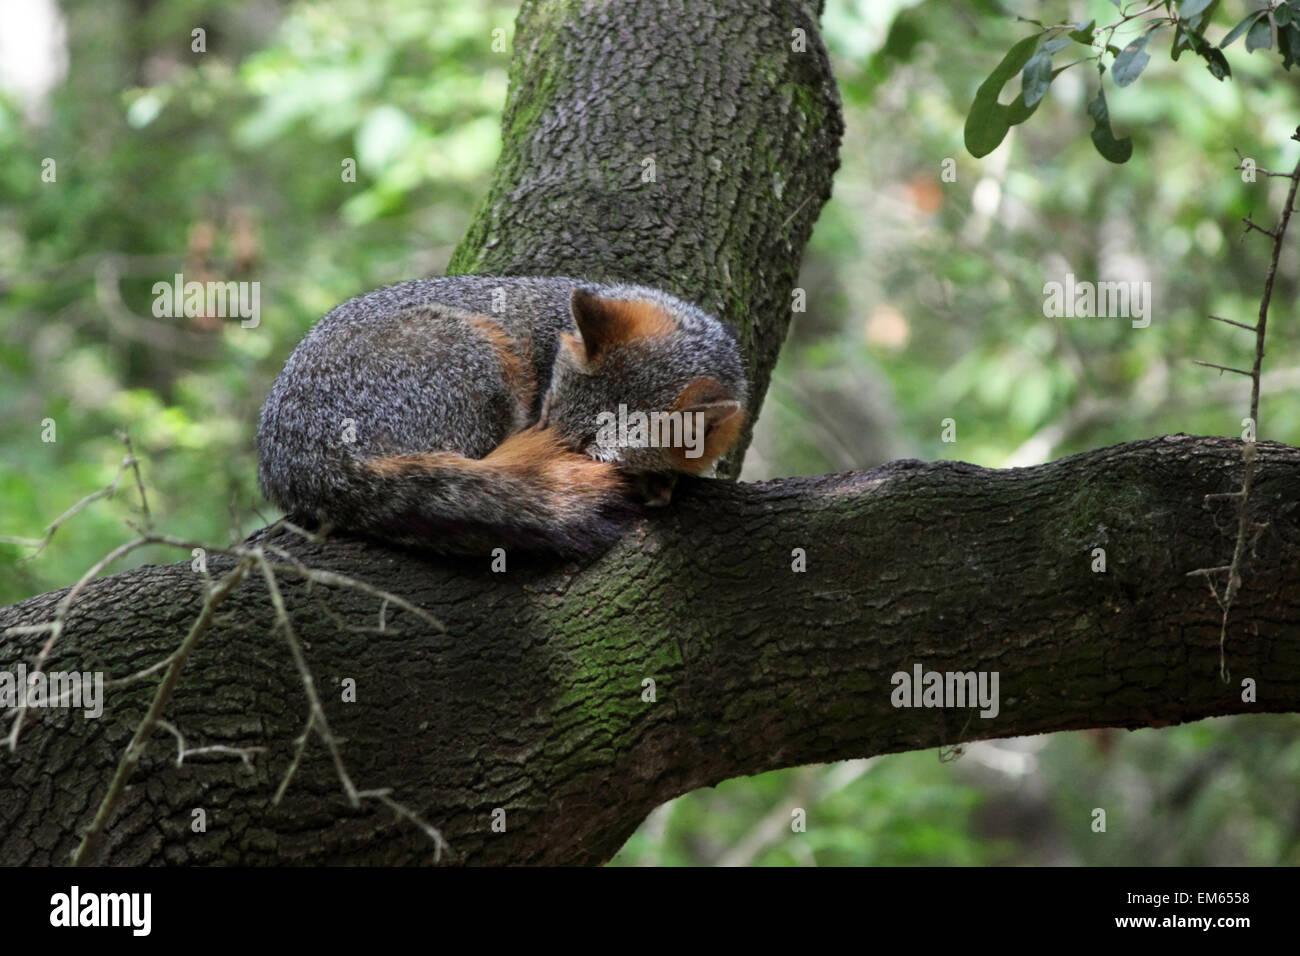 Napping Fox - Stock Image